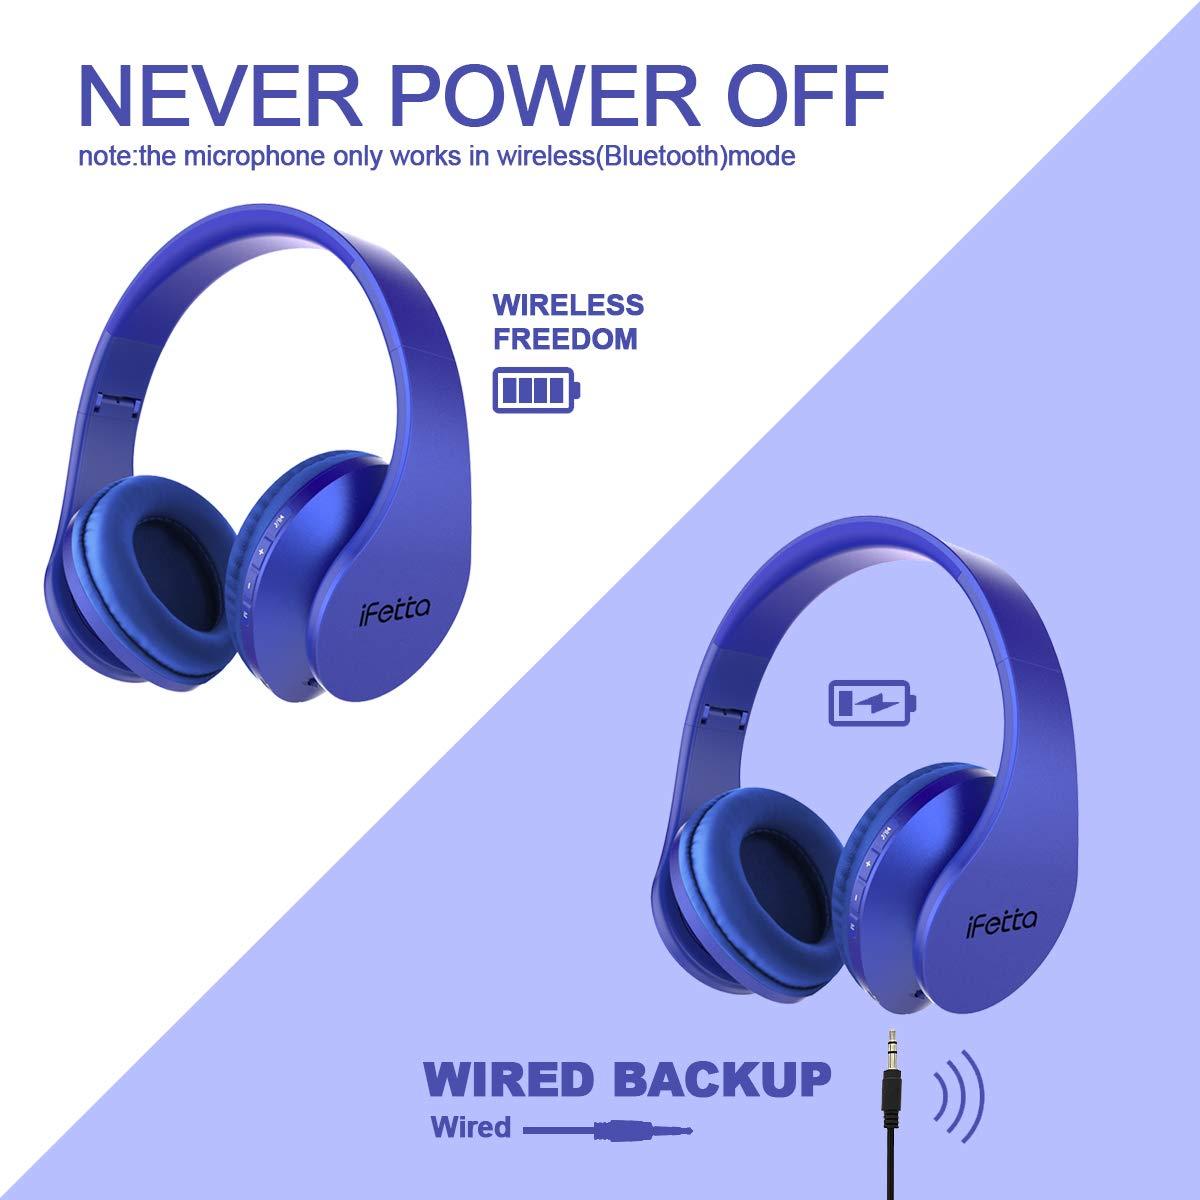 Bluetooth Kopfhörer, Ifecco Bluetooth Headset Wirless Ohrpolster Kopfhörer, Stereo-Headset Sport Hörer Kompatibel mit Allen Gängigen Smartphones/Tablets/Notebooks (blau)